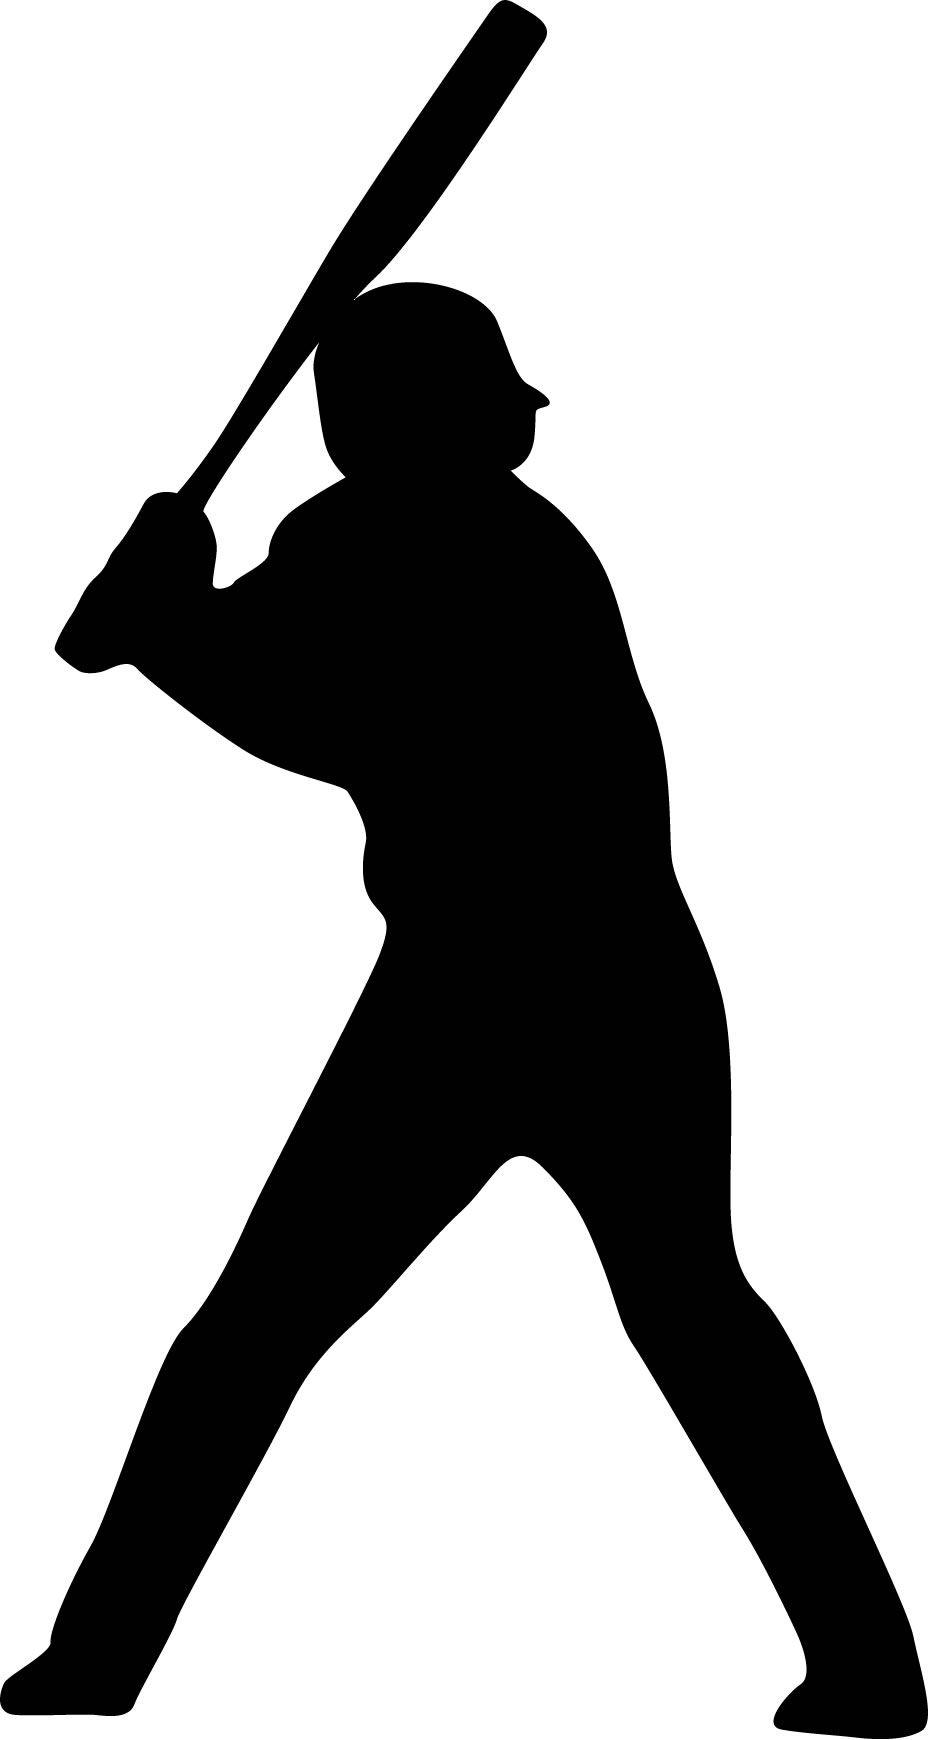 928x1740 Baseball Player Batting Stance Righty Silhouette Custom Wall